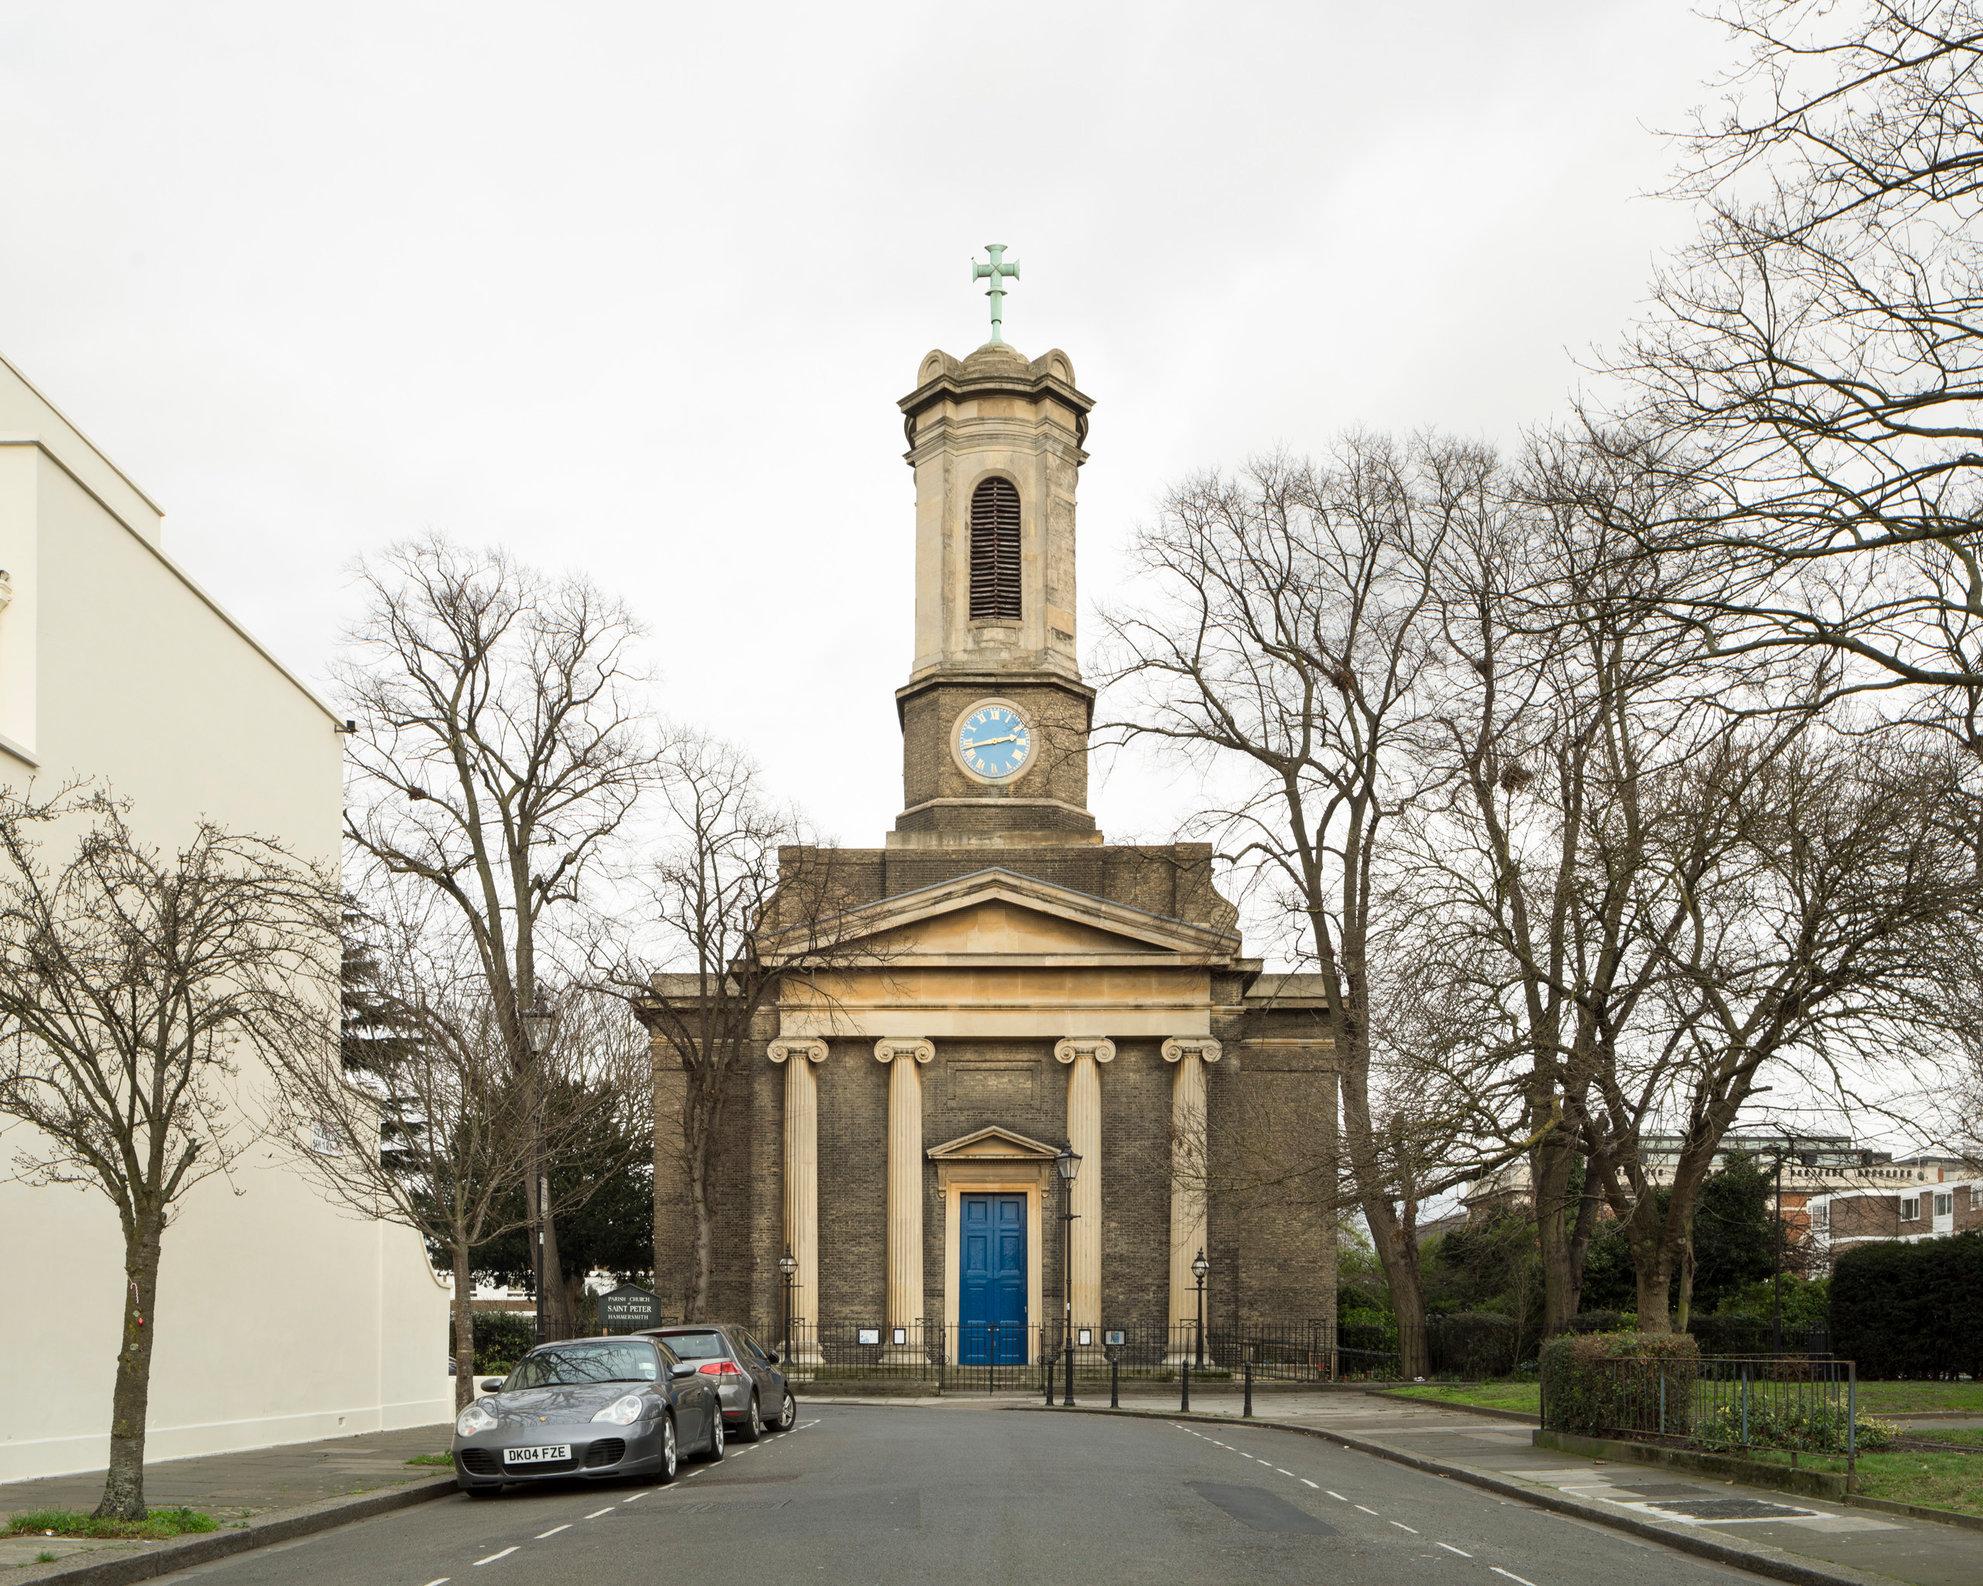 St Peter's, Hammersmith. Edward Lapidge